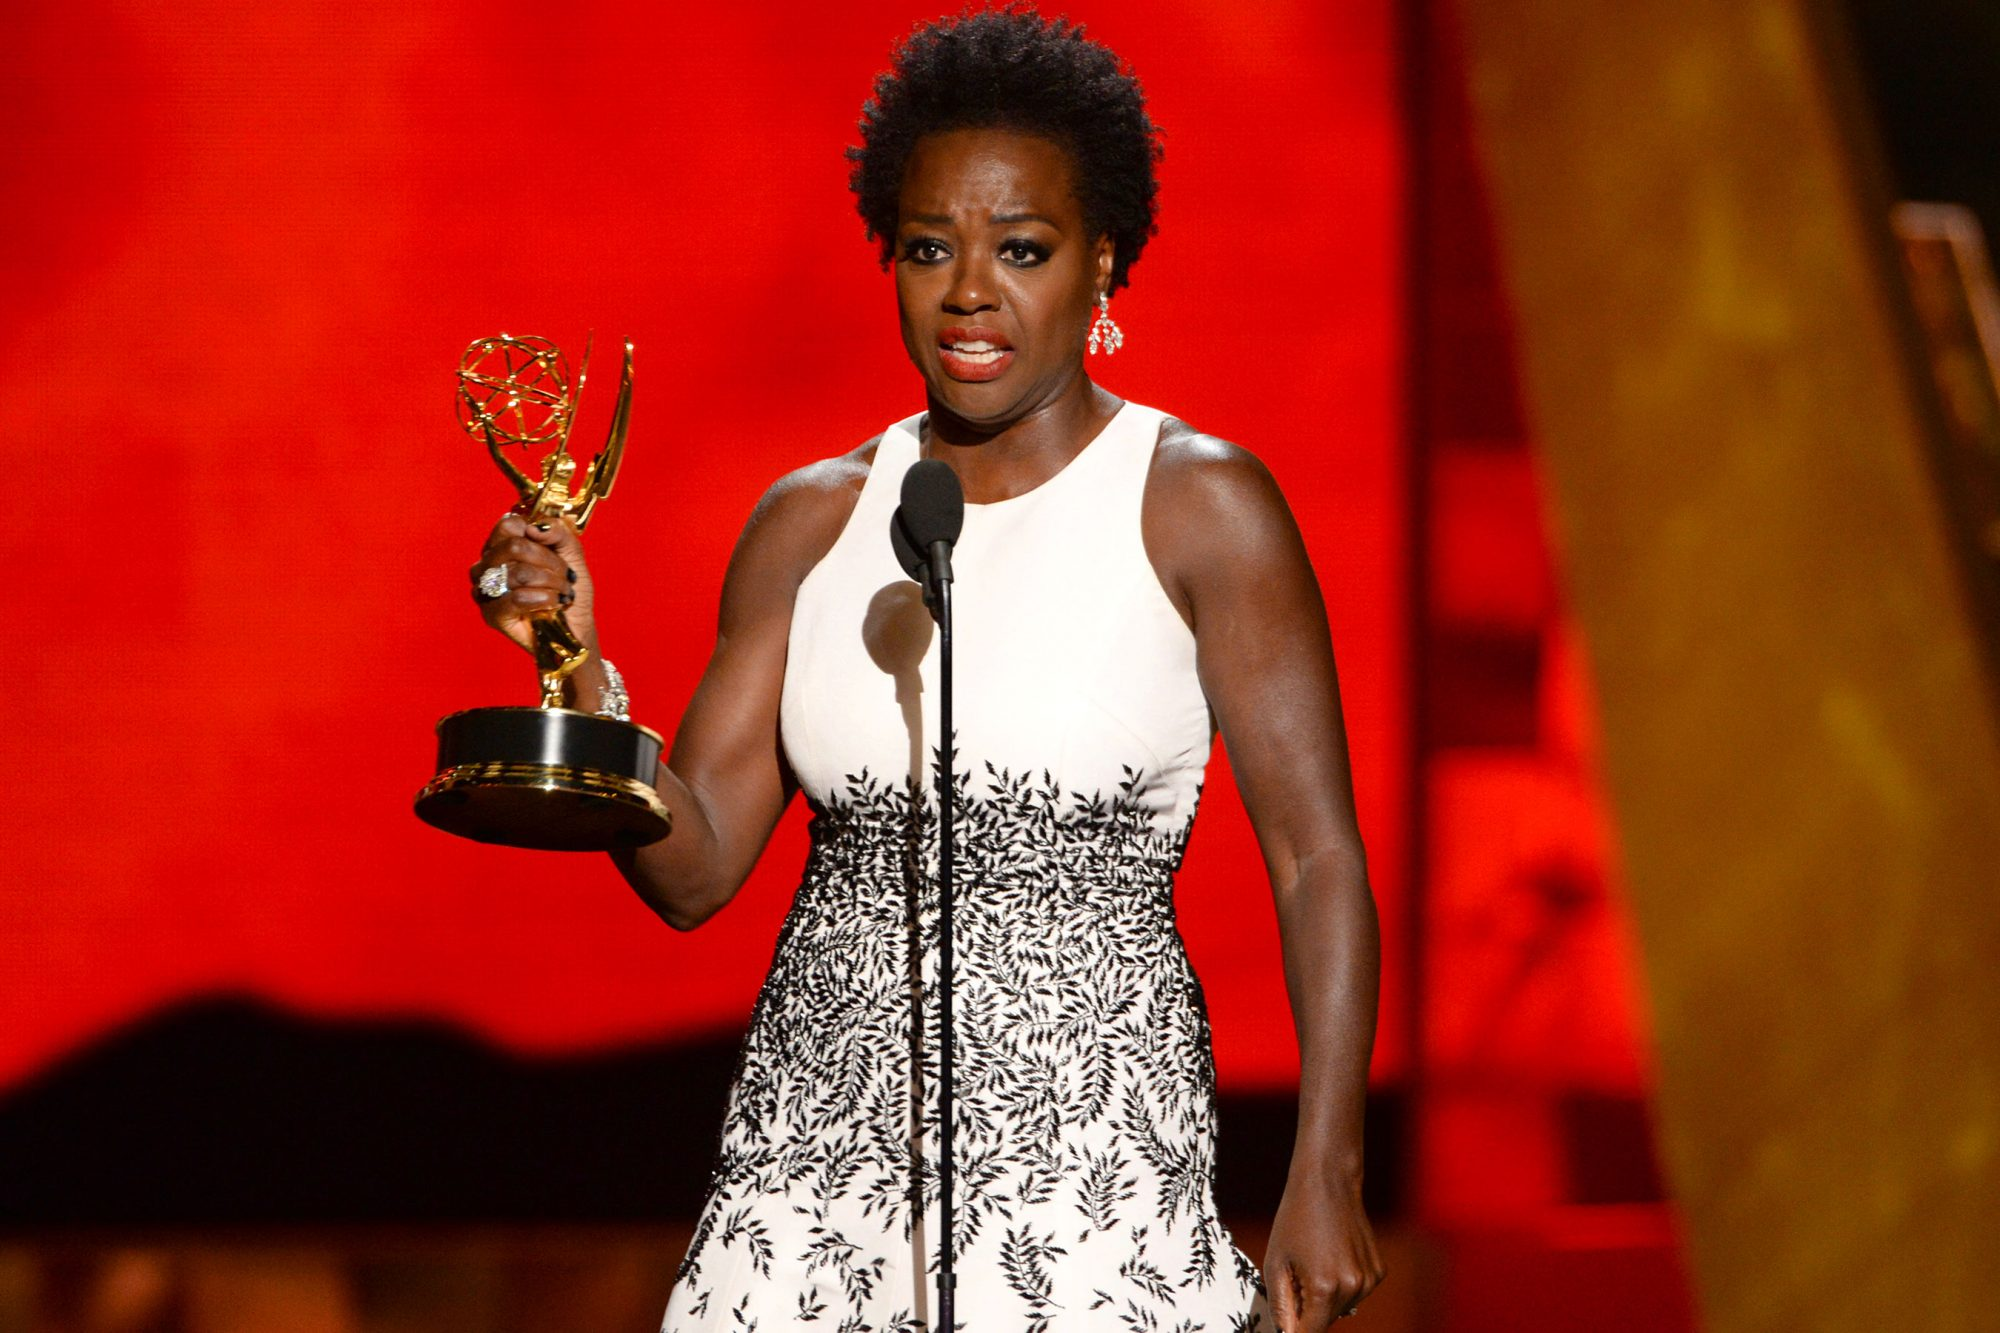 67th Primetime Emmy Awards - Show, Los Angeles, USA - 20 Sep 2015